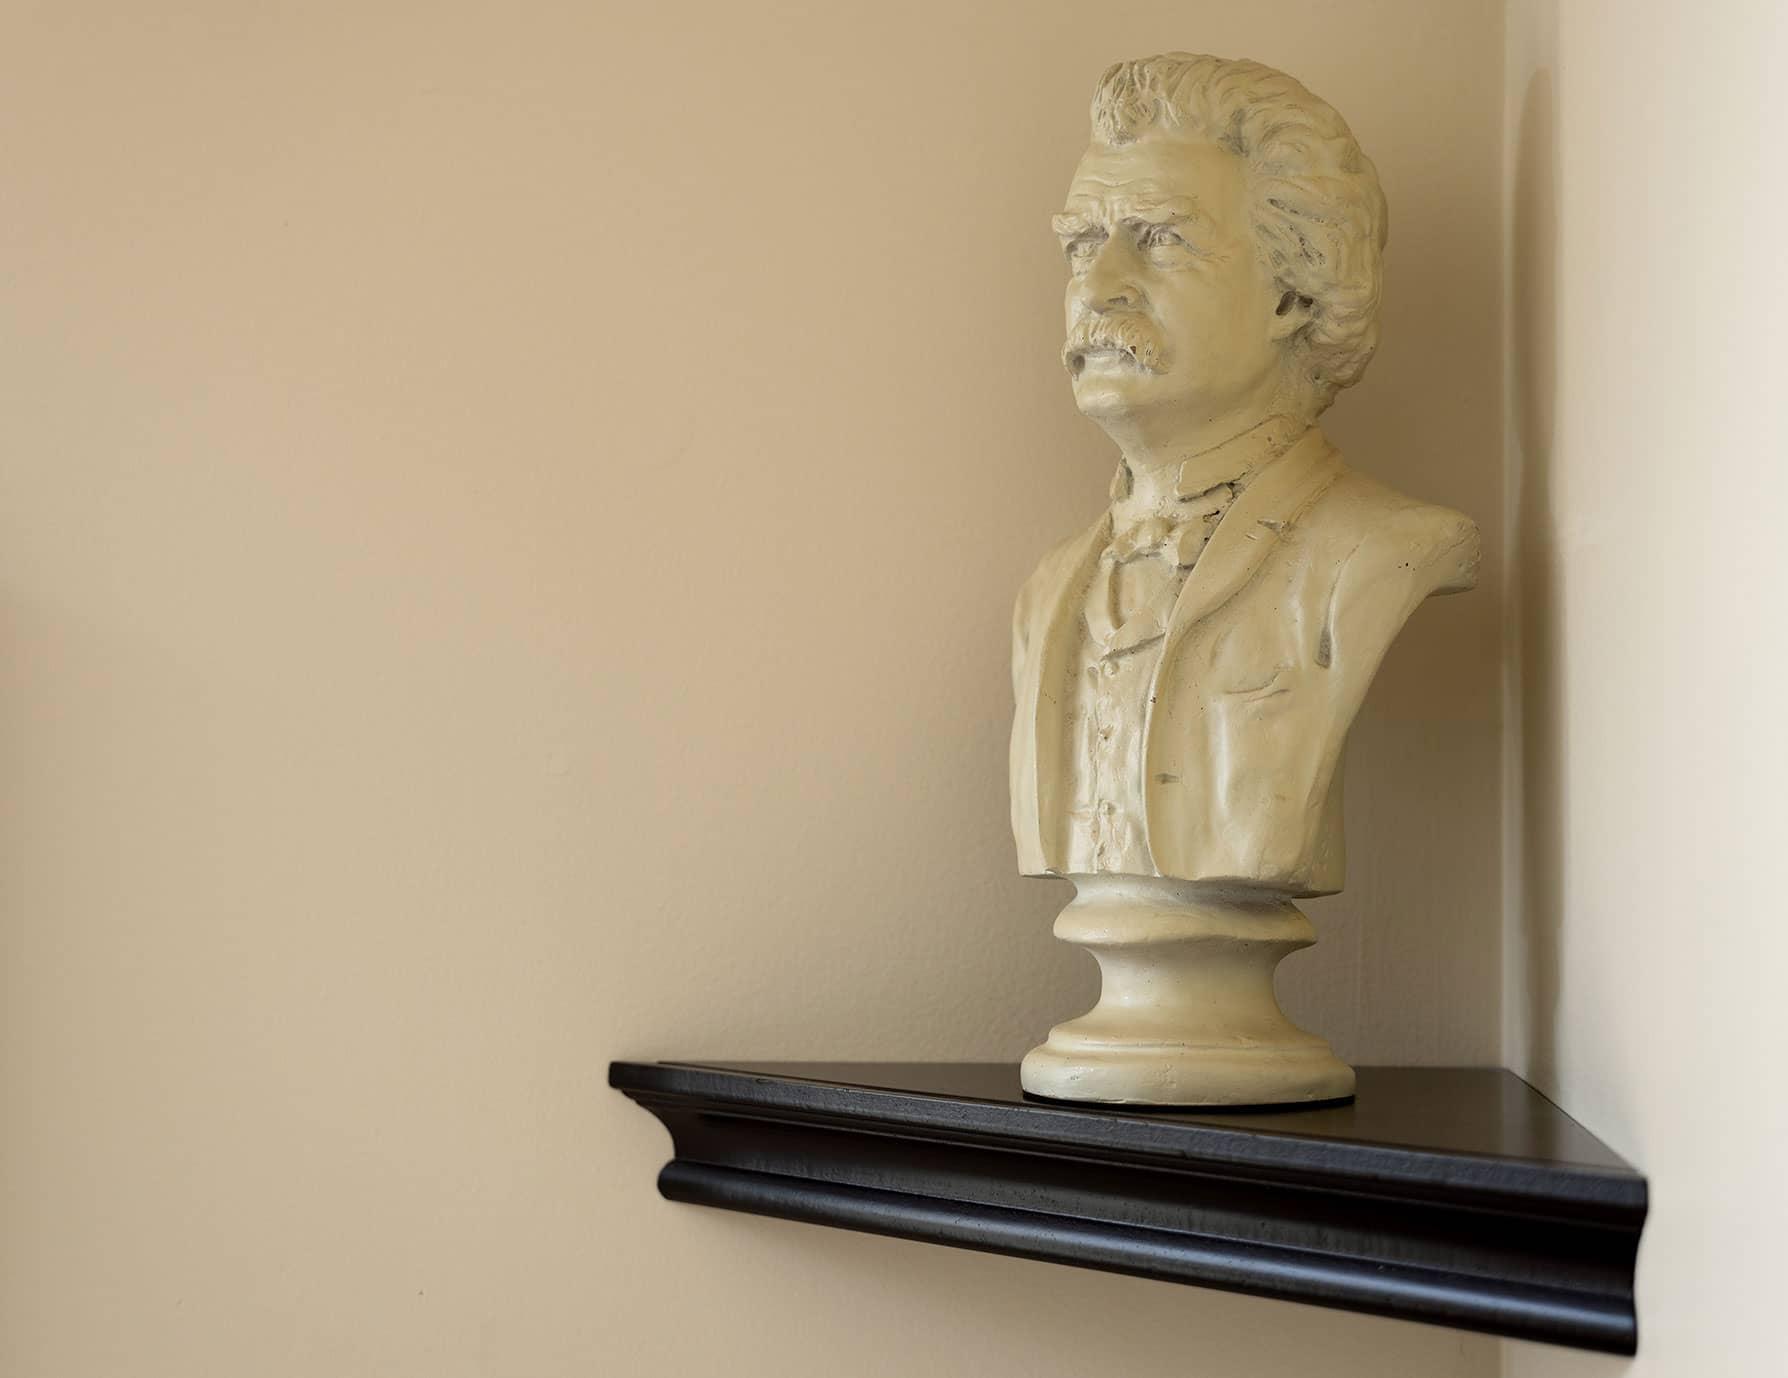 Plaster bust of Mark Twain